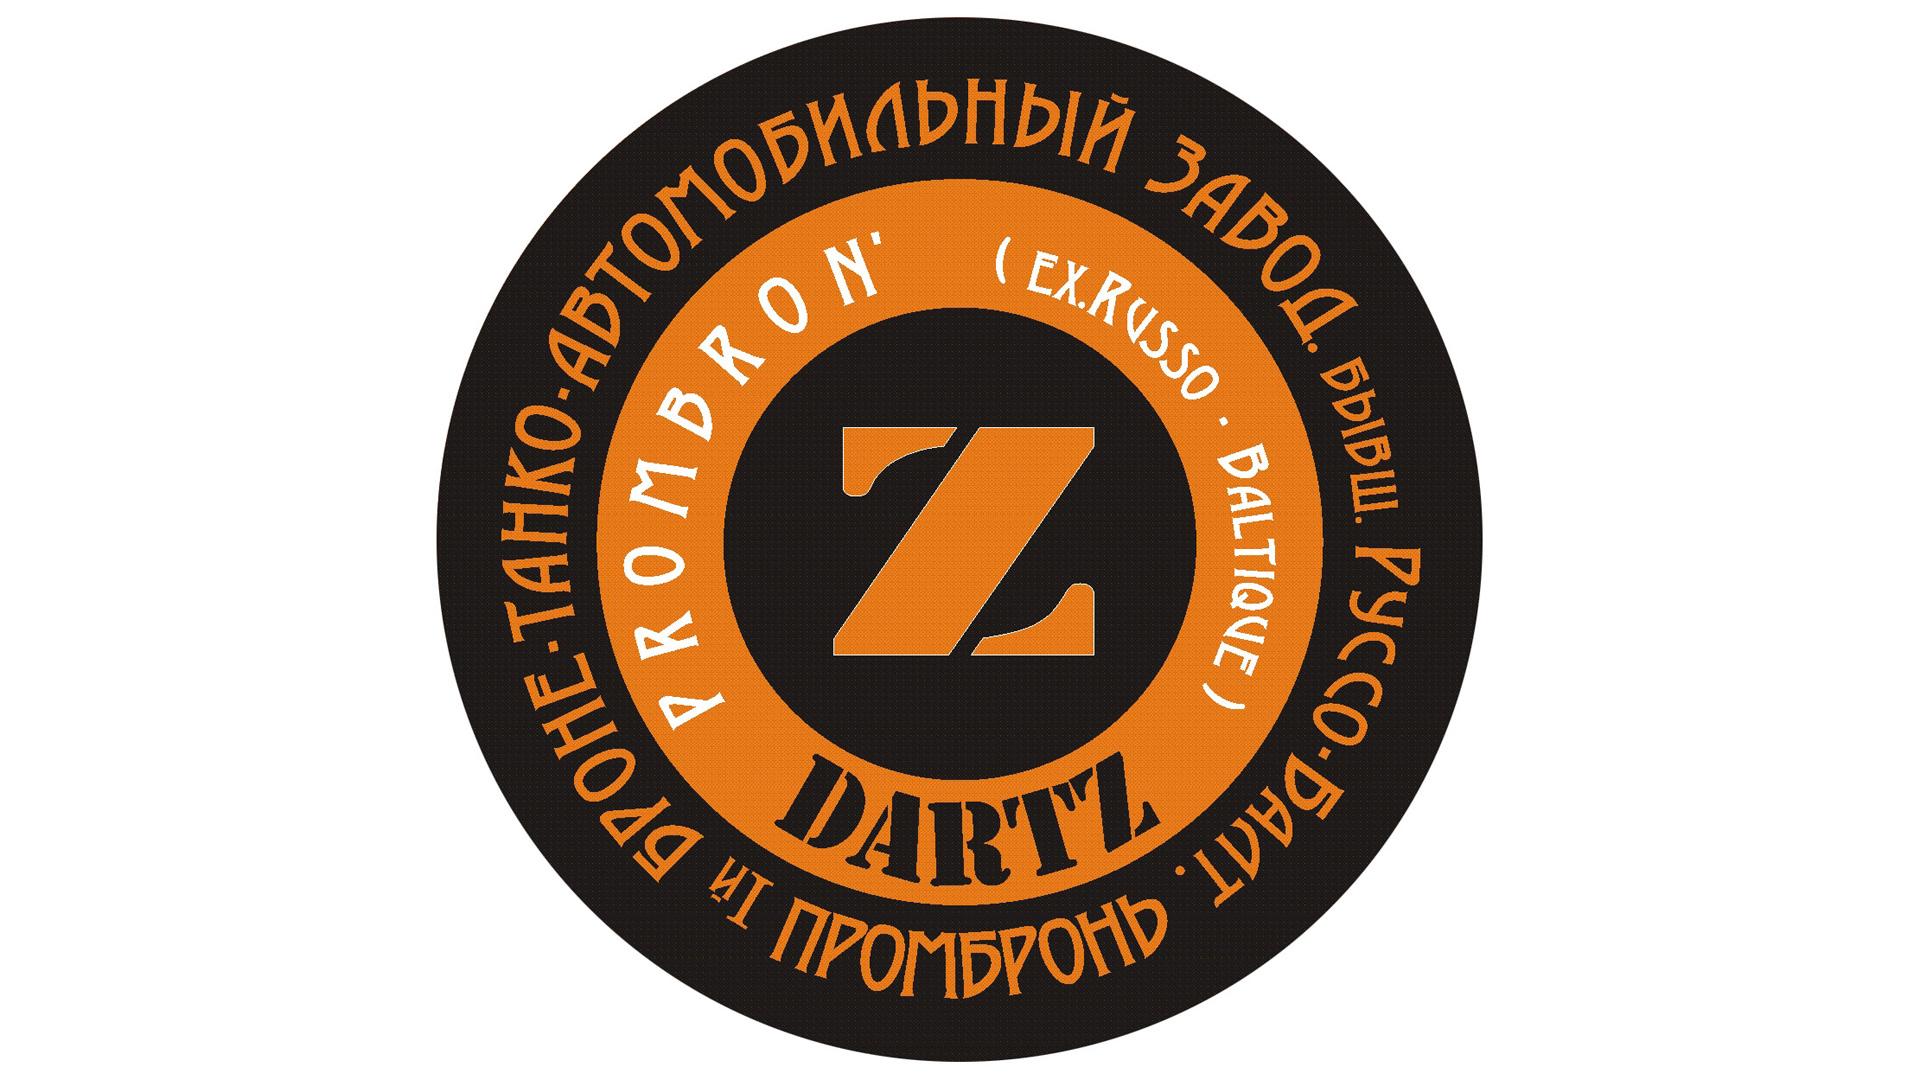 Car Brands Starting With L >> Dartz Logo, Information | Carlogos.org